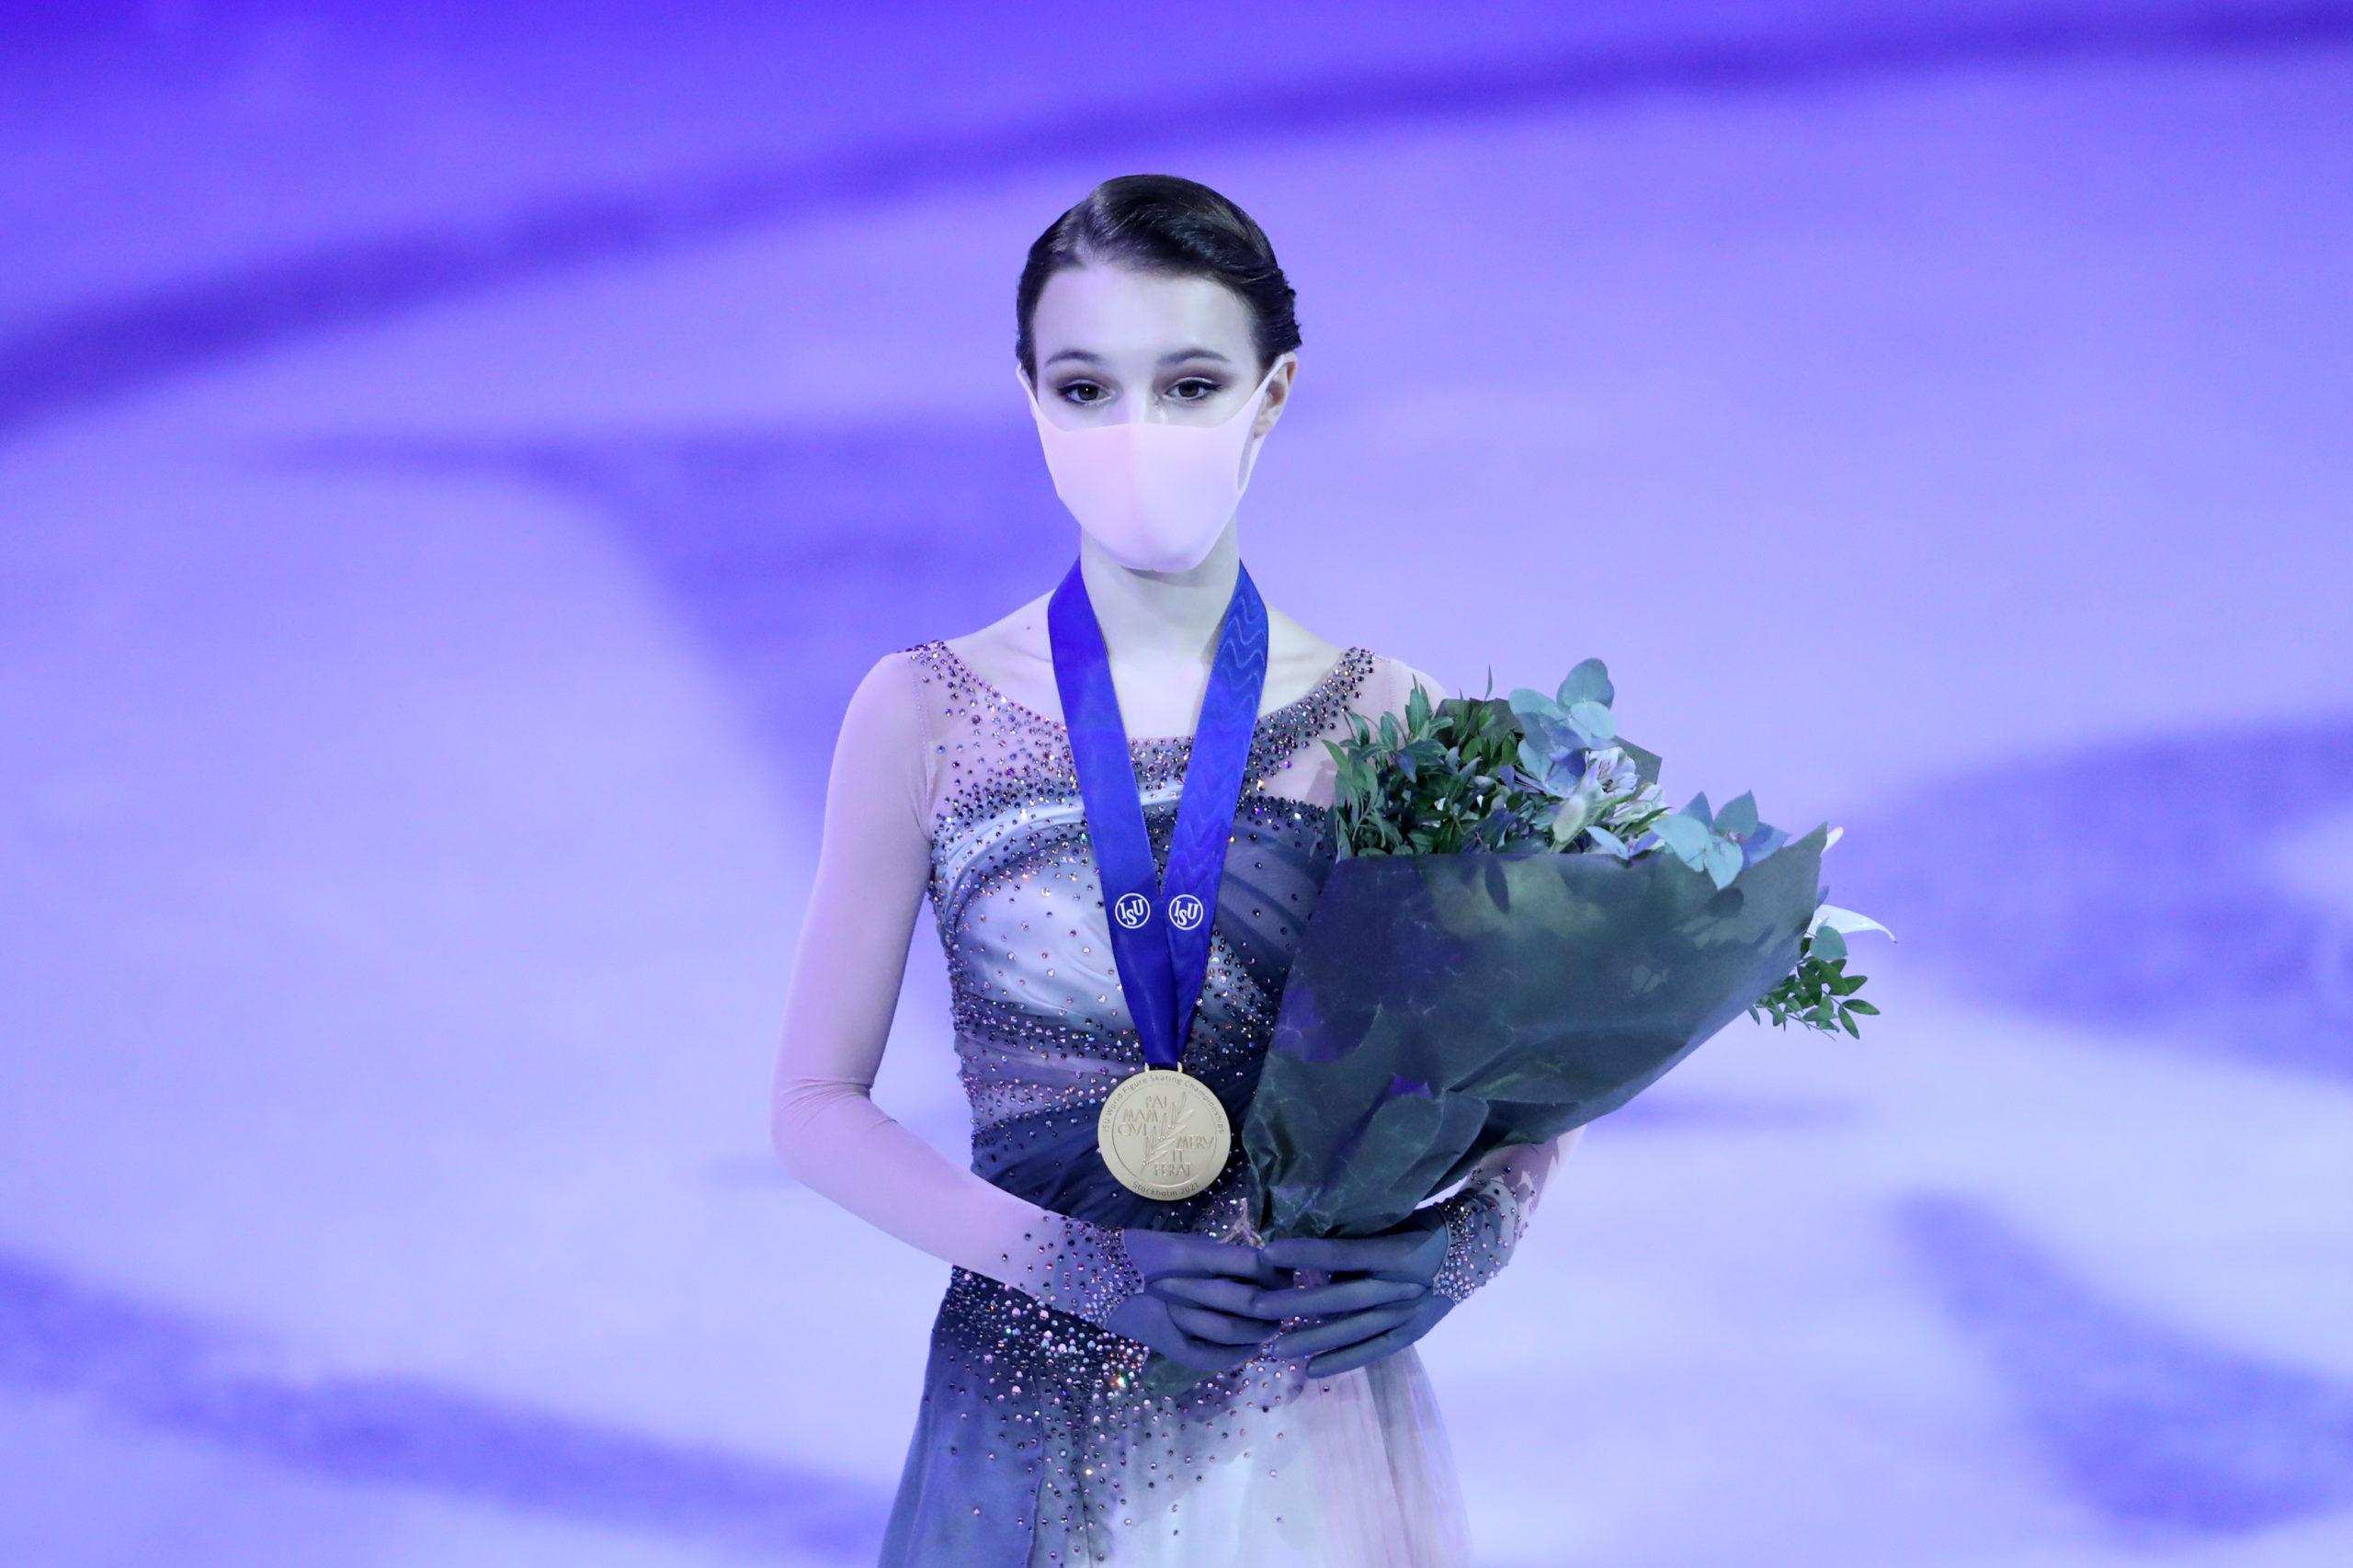 Анна Щербакова (Фото: Linnea Rheborg/Getty Images)